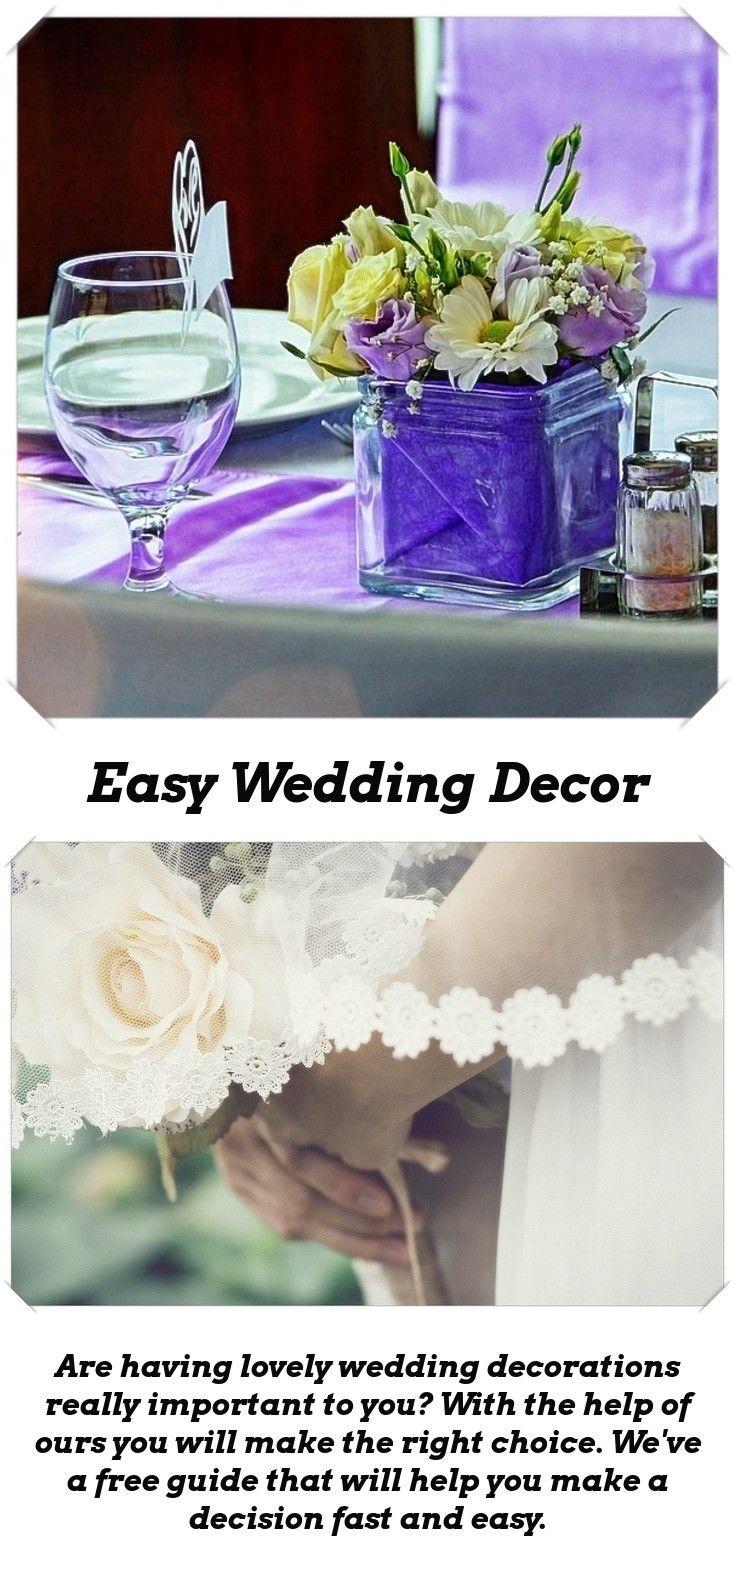 Wedding decorations to make  Decoration Ideas For Your Wedding  Pinterest  Romantic wedding